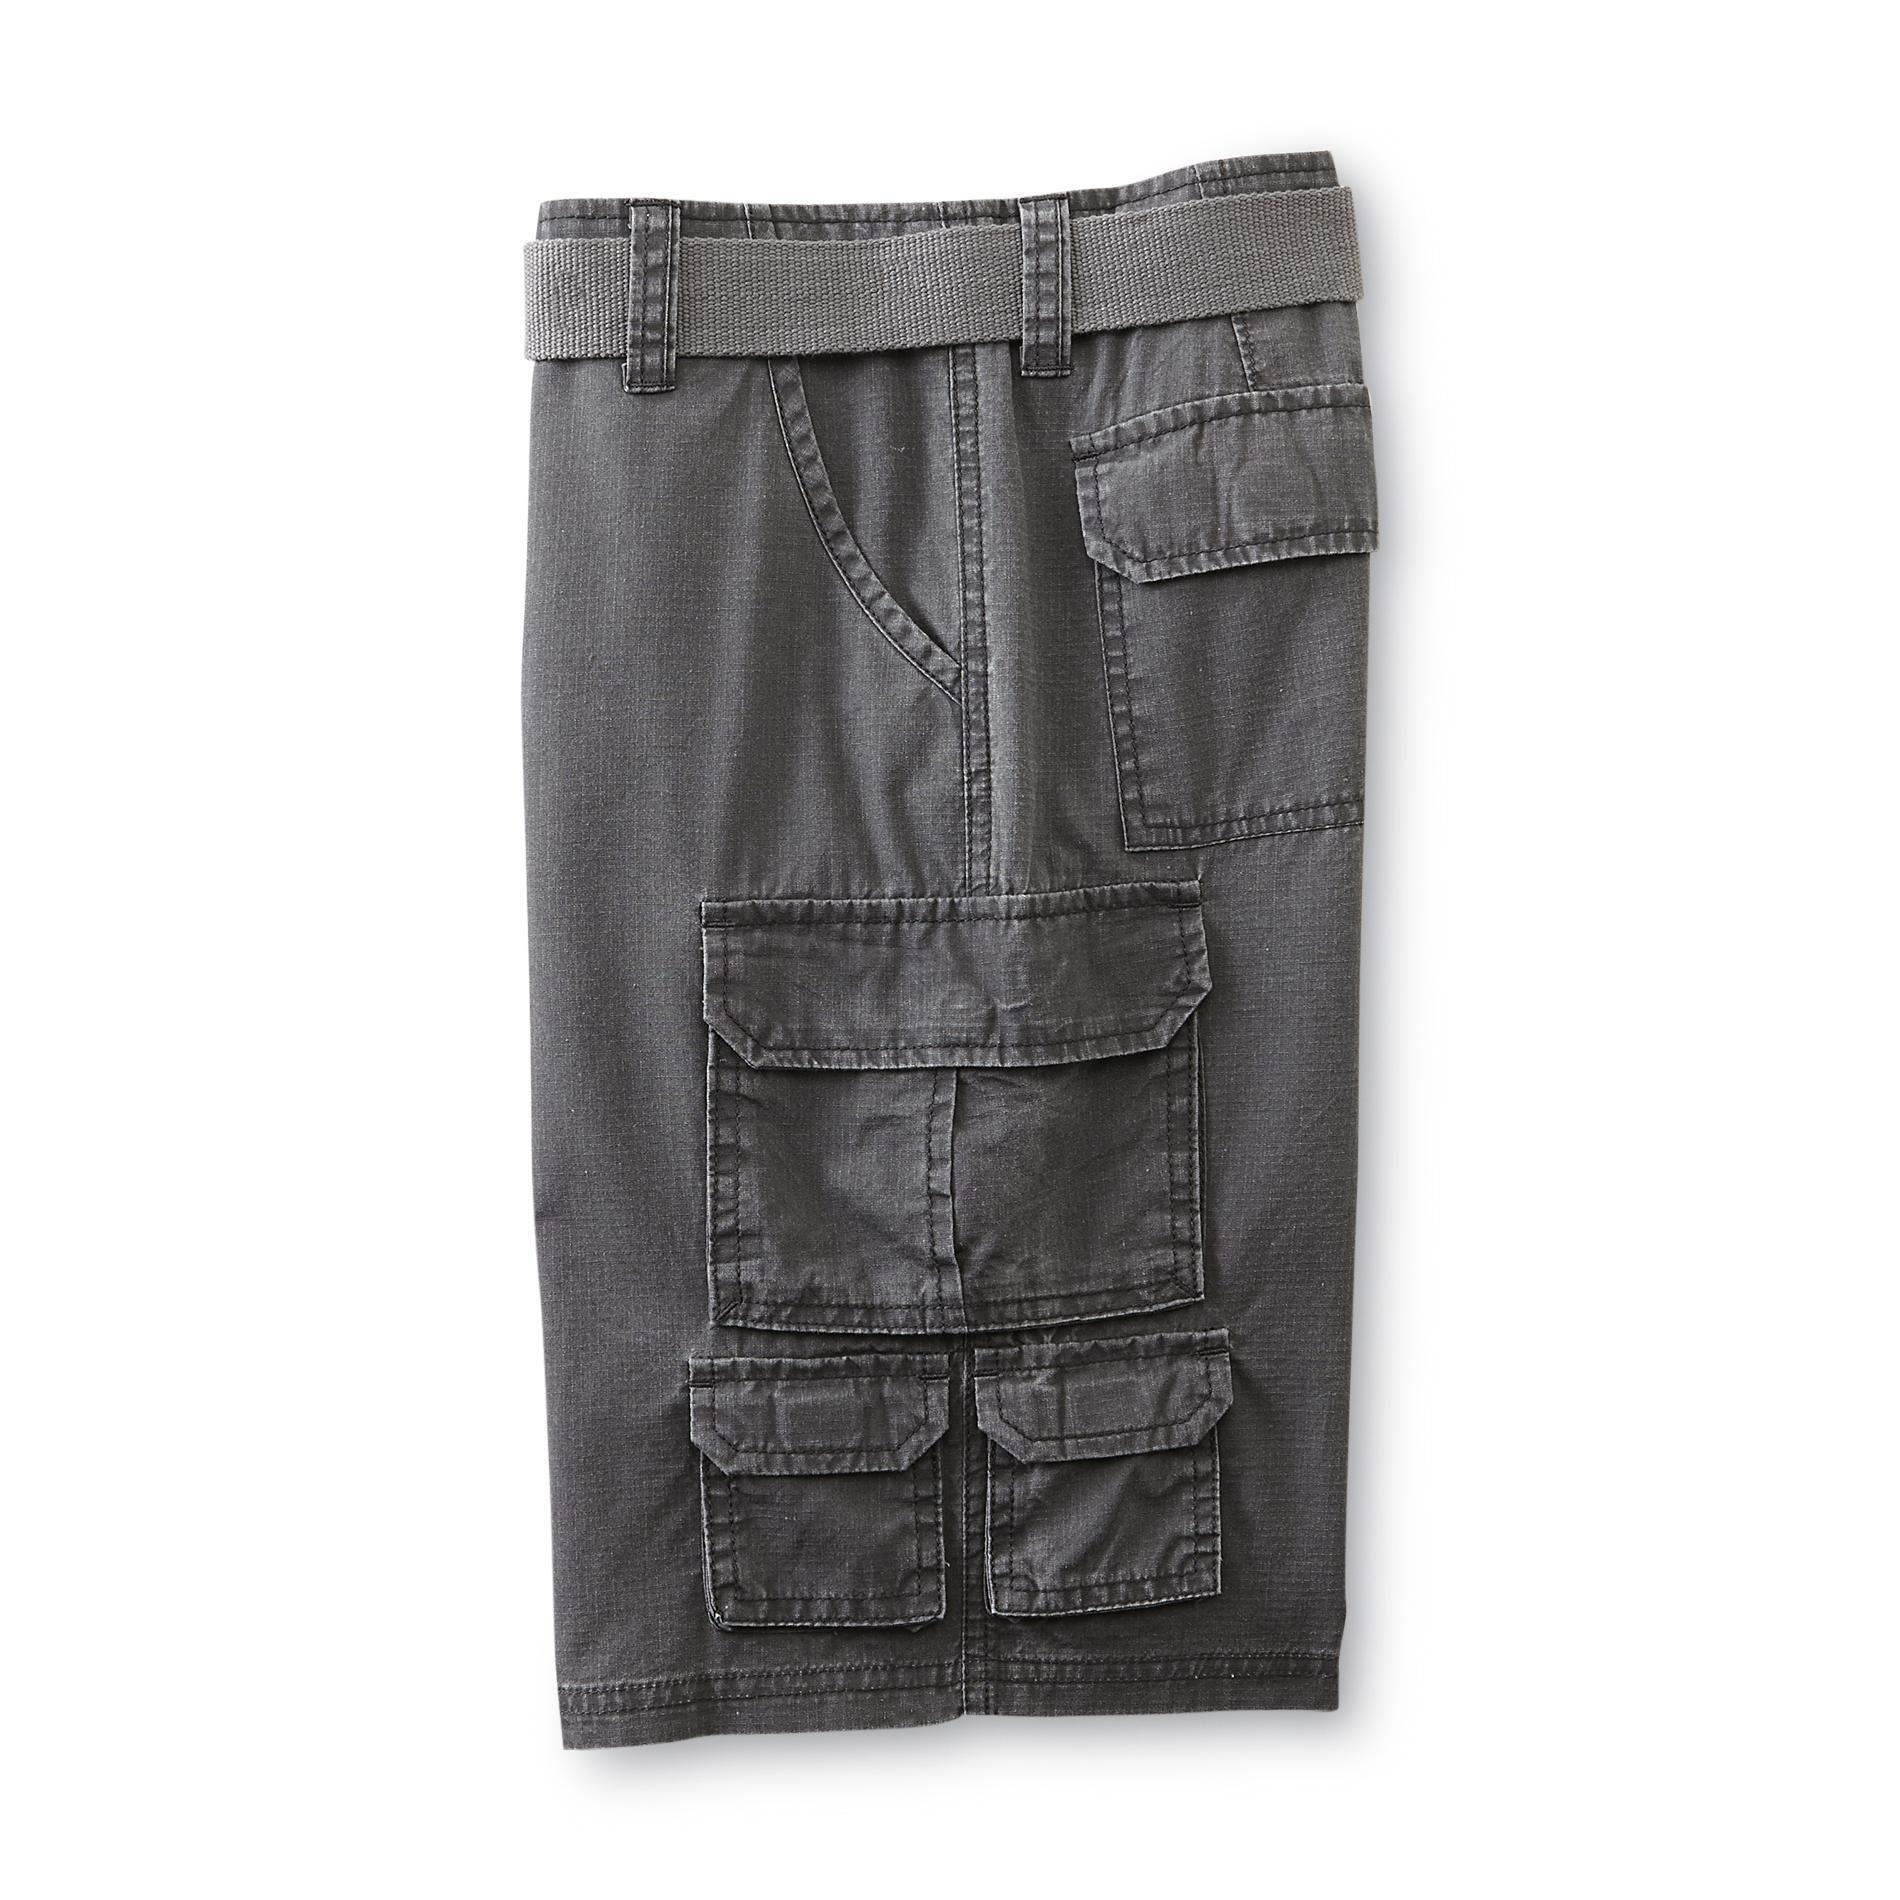 SK2 Boy's Ripstop Cargo Shorts & Belt